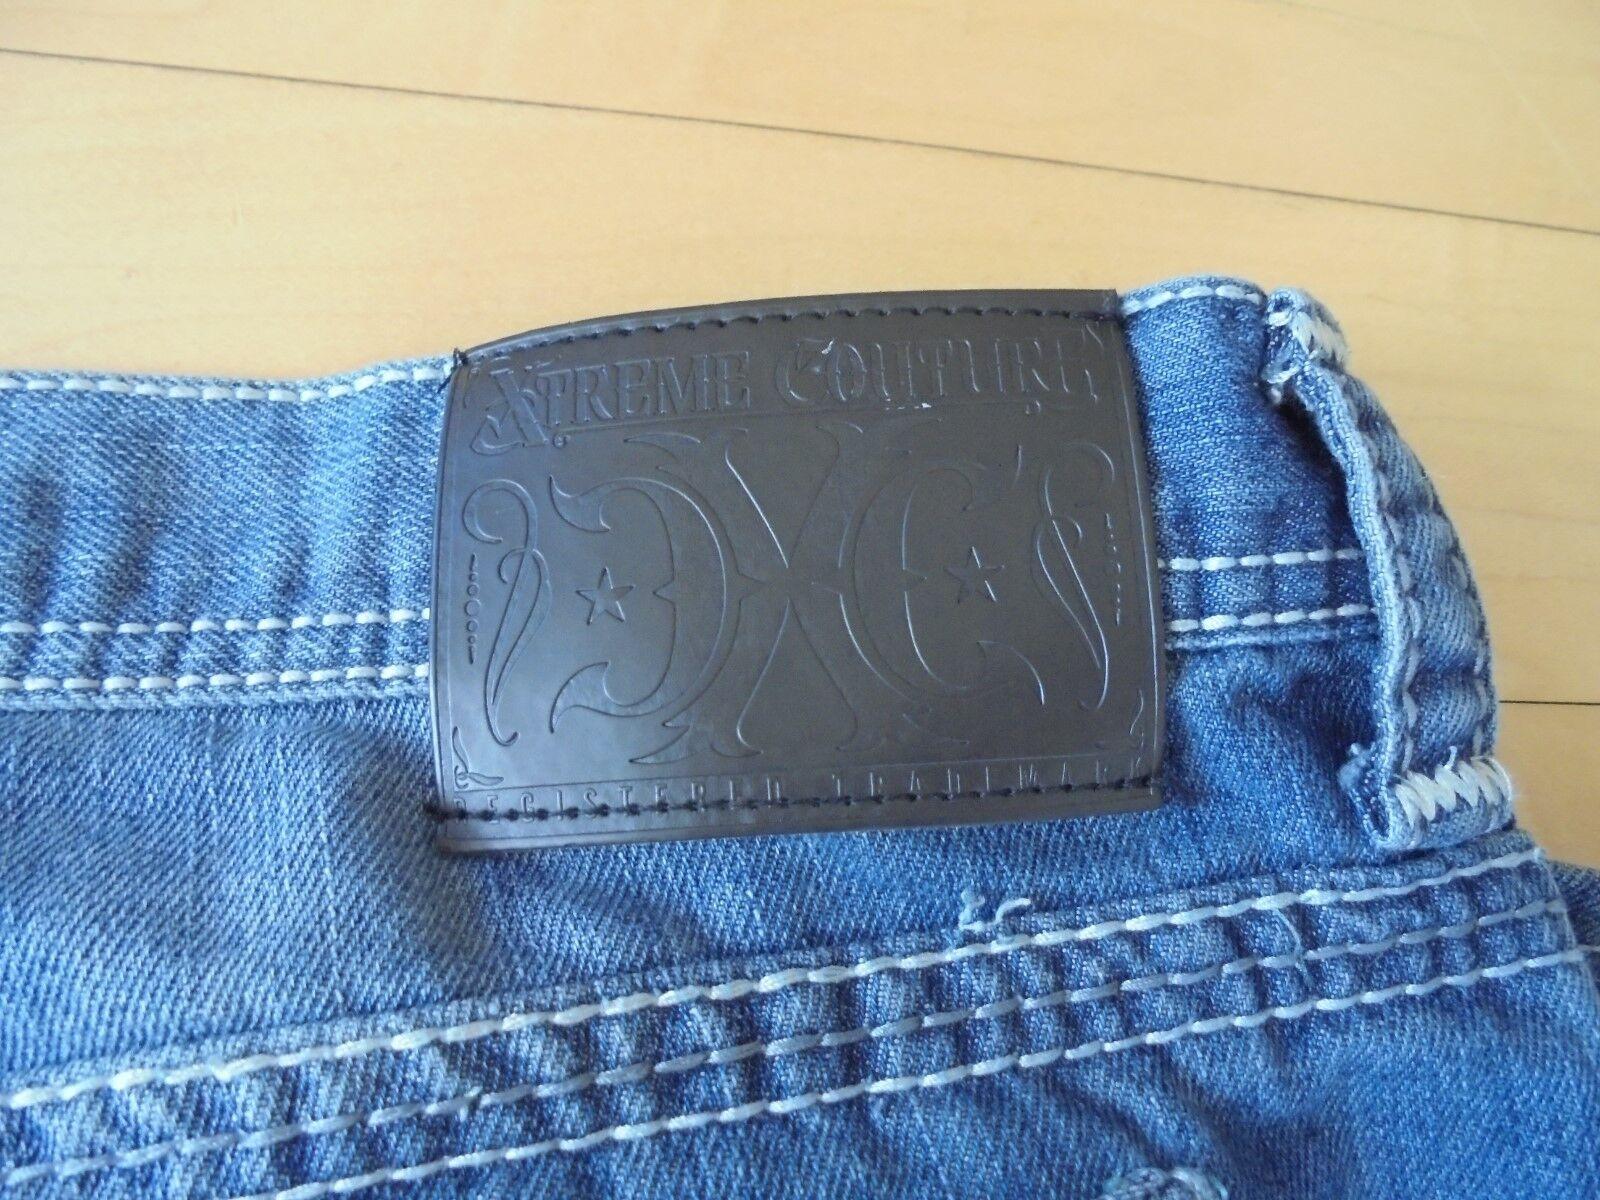 HOMBRE Extreme Couture Denum Casual 36 Vaqueros Talla 36 Casual 72163d